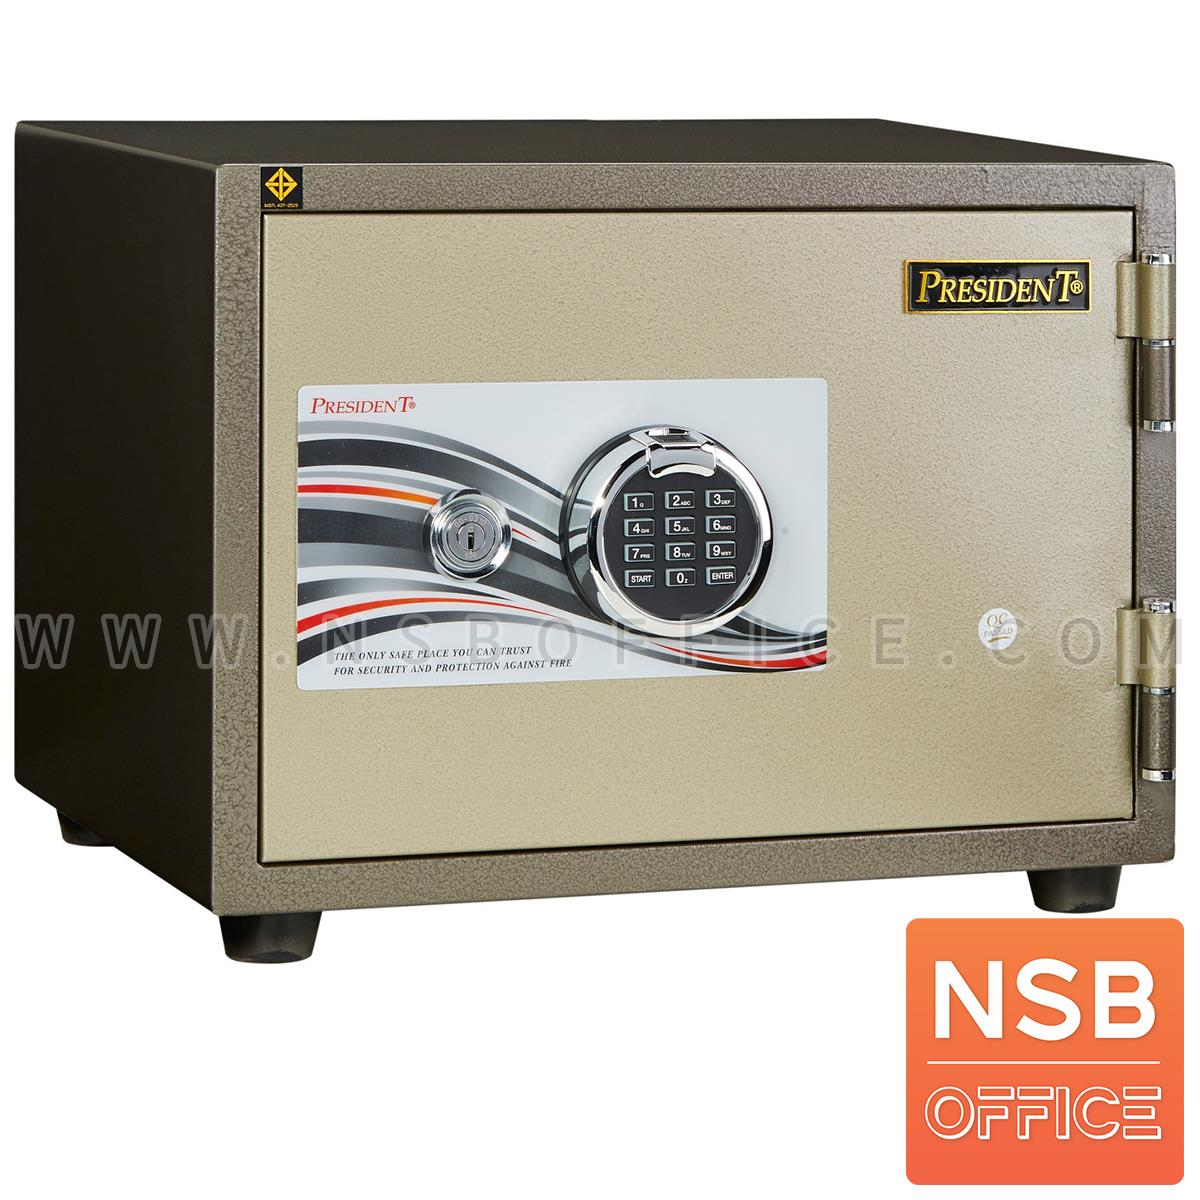 F05A077:ตู้เซฟนิรภัยดิจิตอลระบบสแกนนิ้วมือ แบบนอน 50 กก.  รุ่น PRESIDENT-SS1-DF มี 1 รหัส 1 กุญแจ